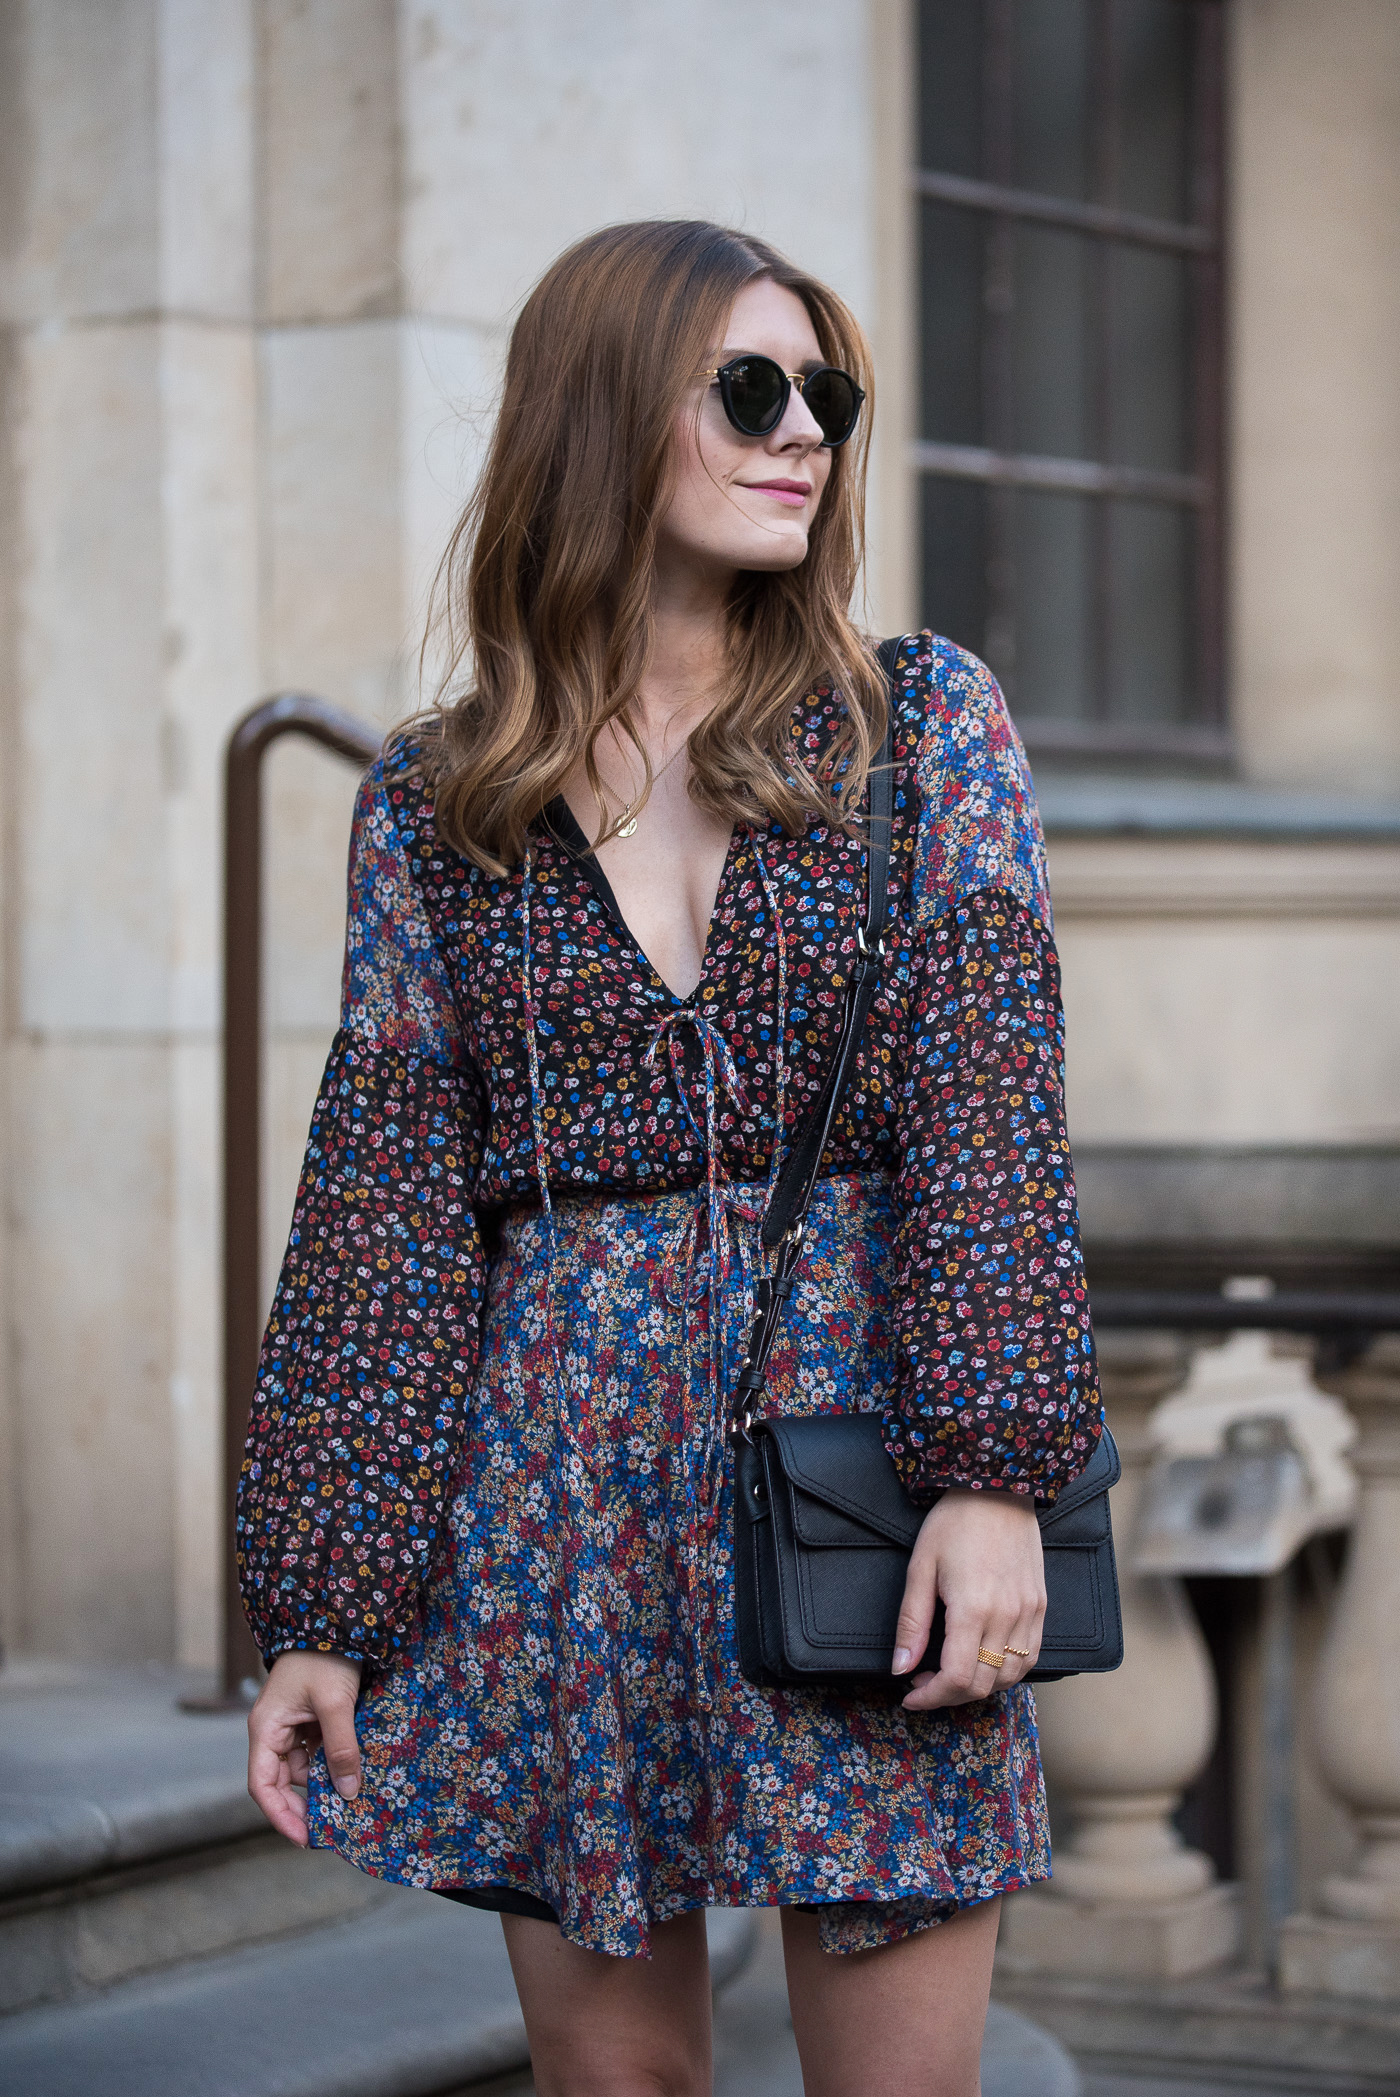 Floral_Summer_Dress_Berlin_Outfit_2